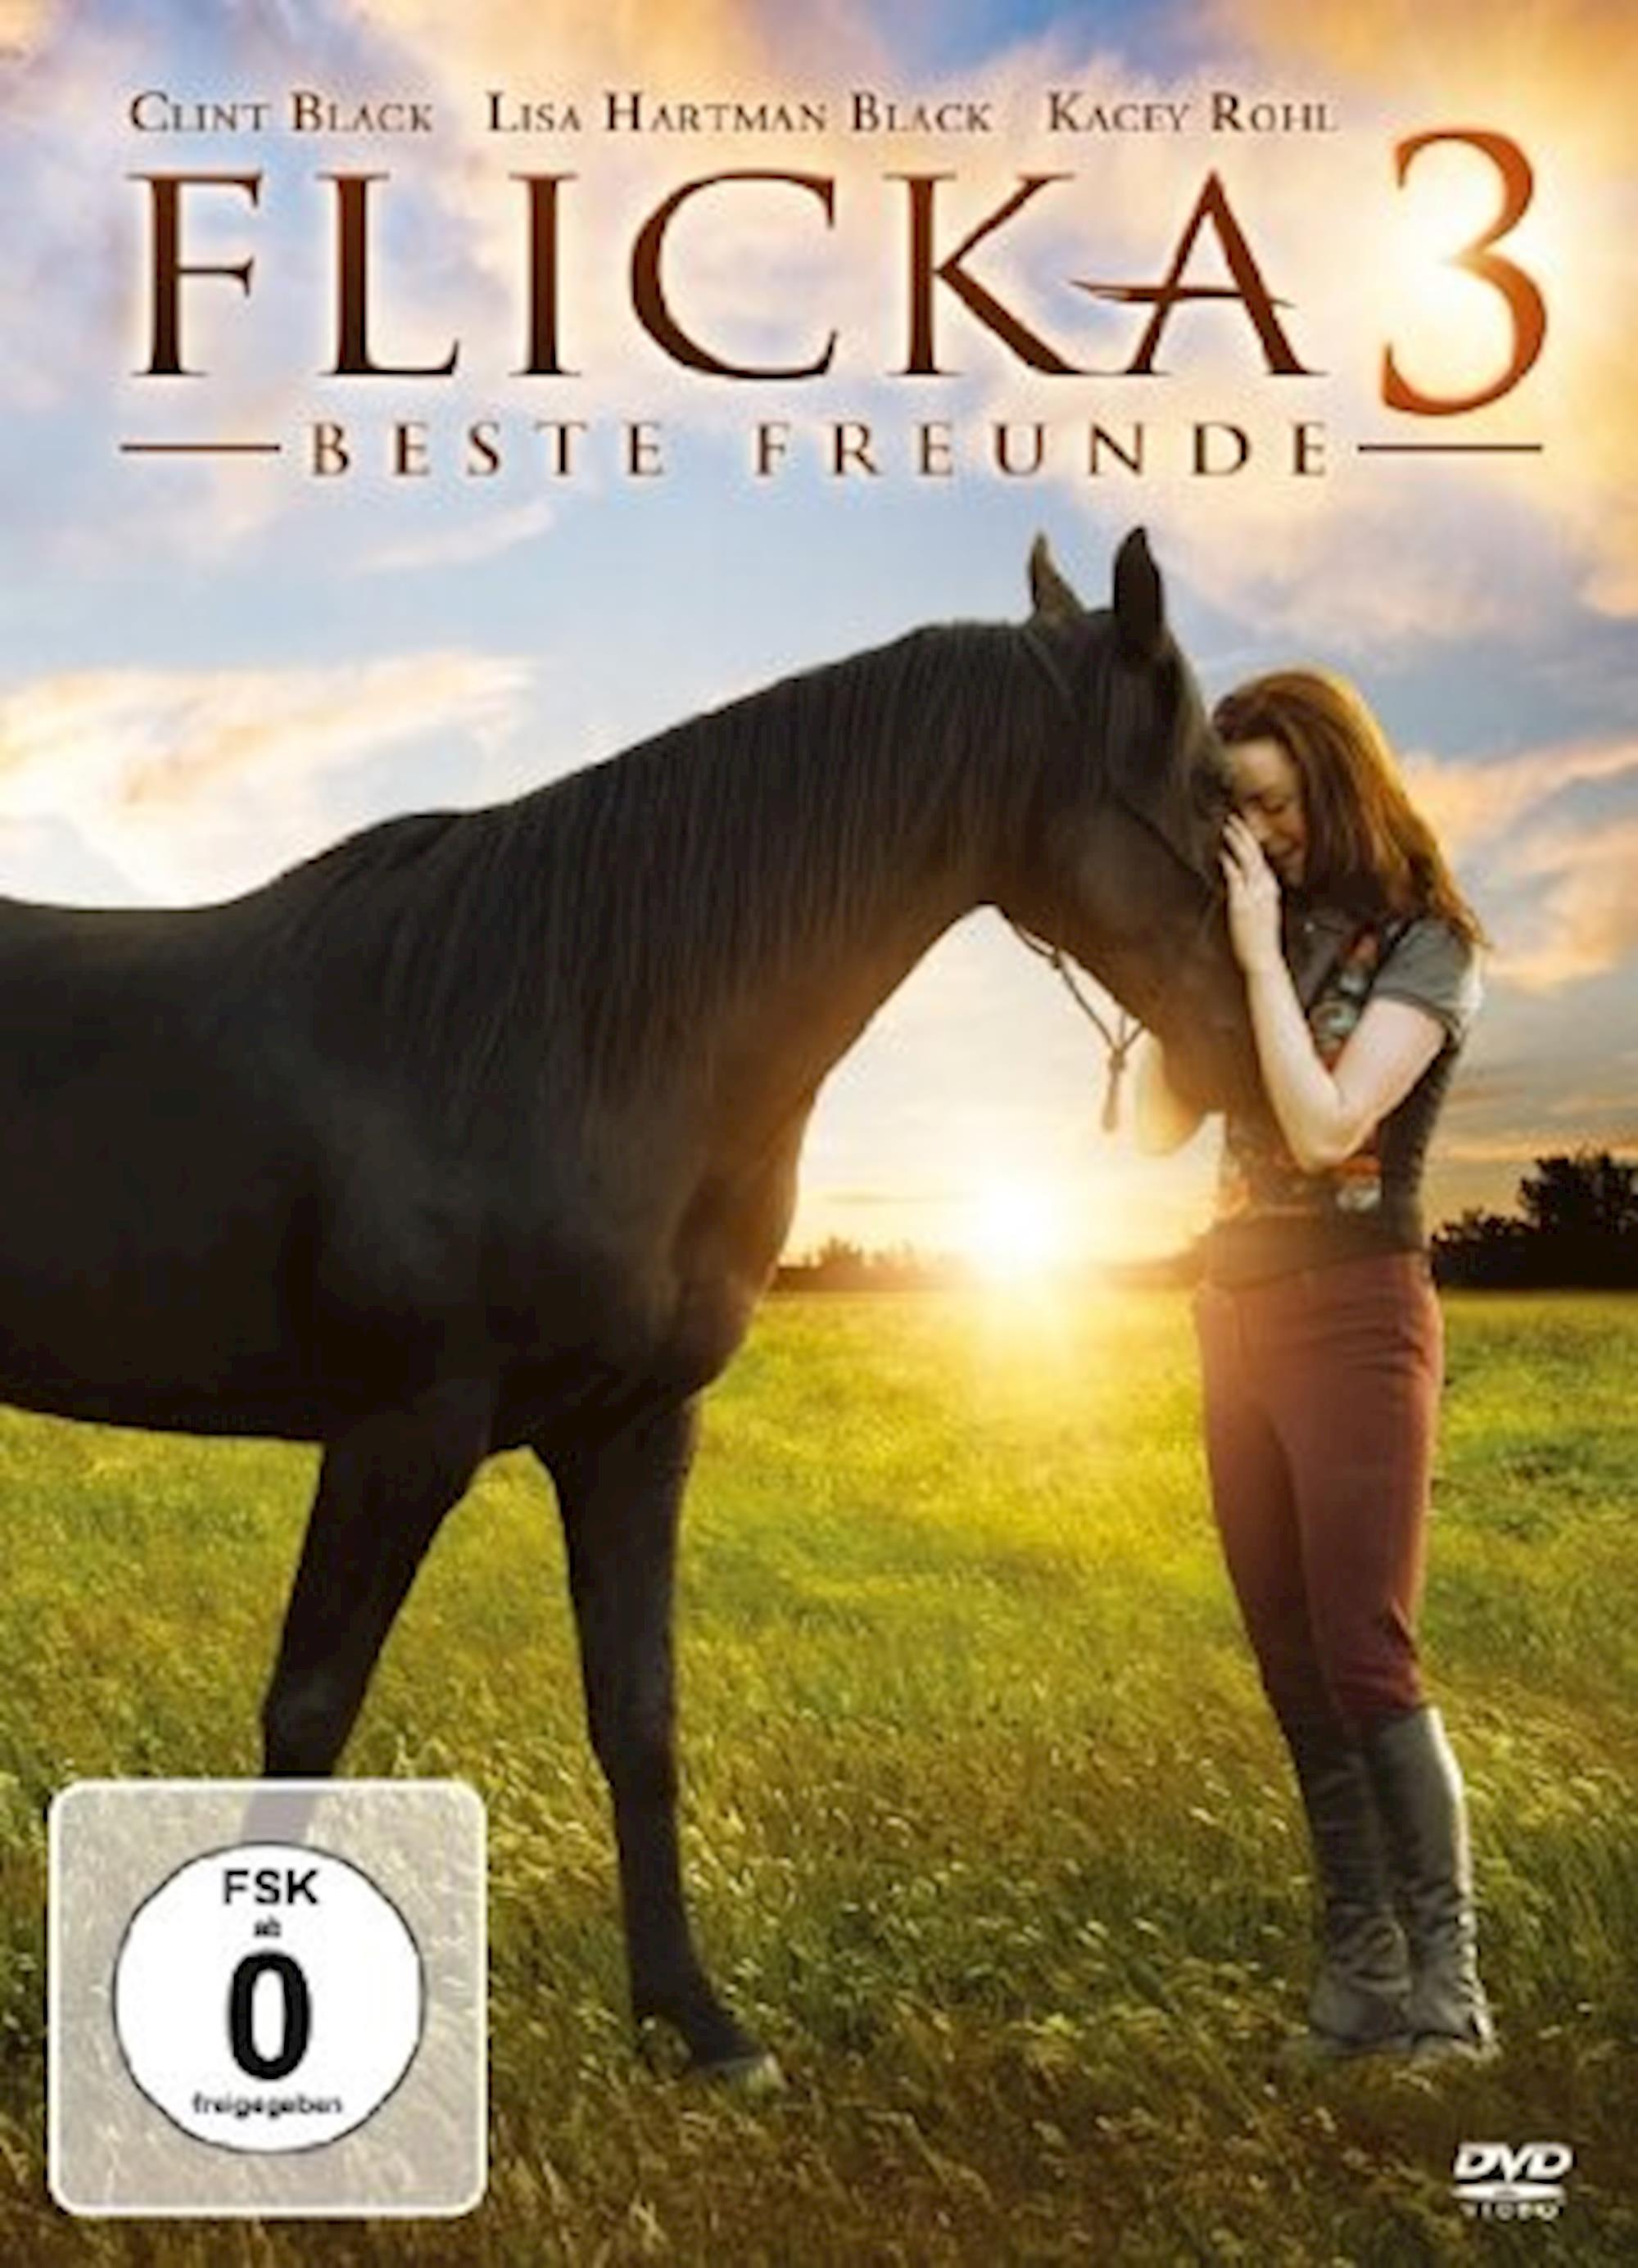 filmes de cavalos, dicas de filmes, Flicka 3,